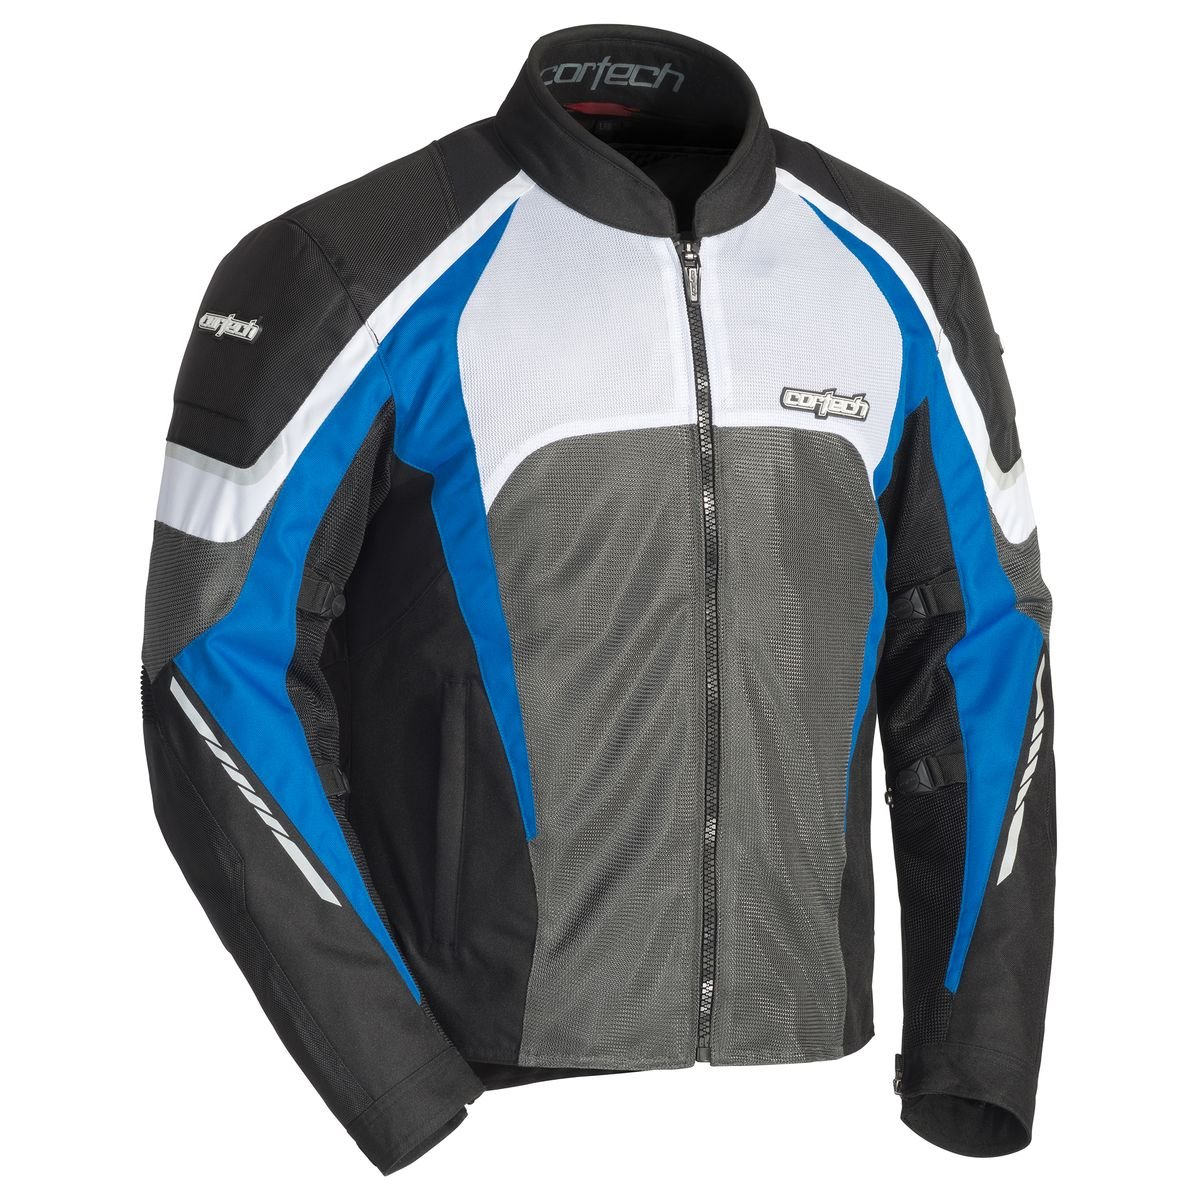 Cortech GX Sport Air 5 Men's Textile Street Motorcycle Jacket - Black/Blue X-Large